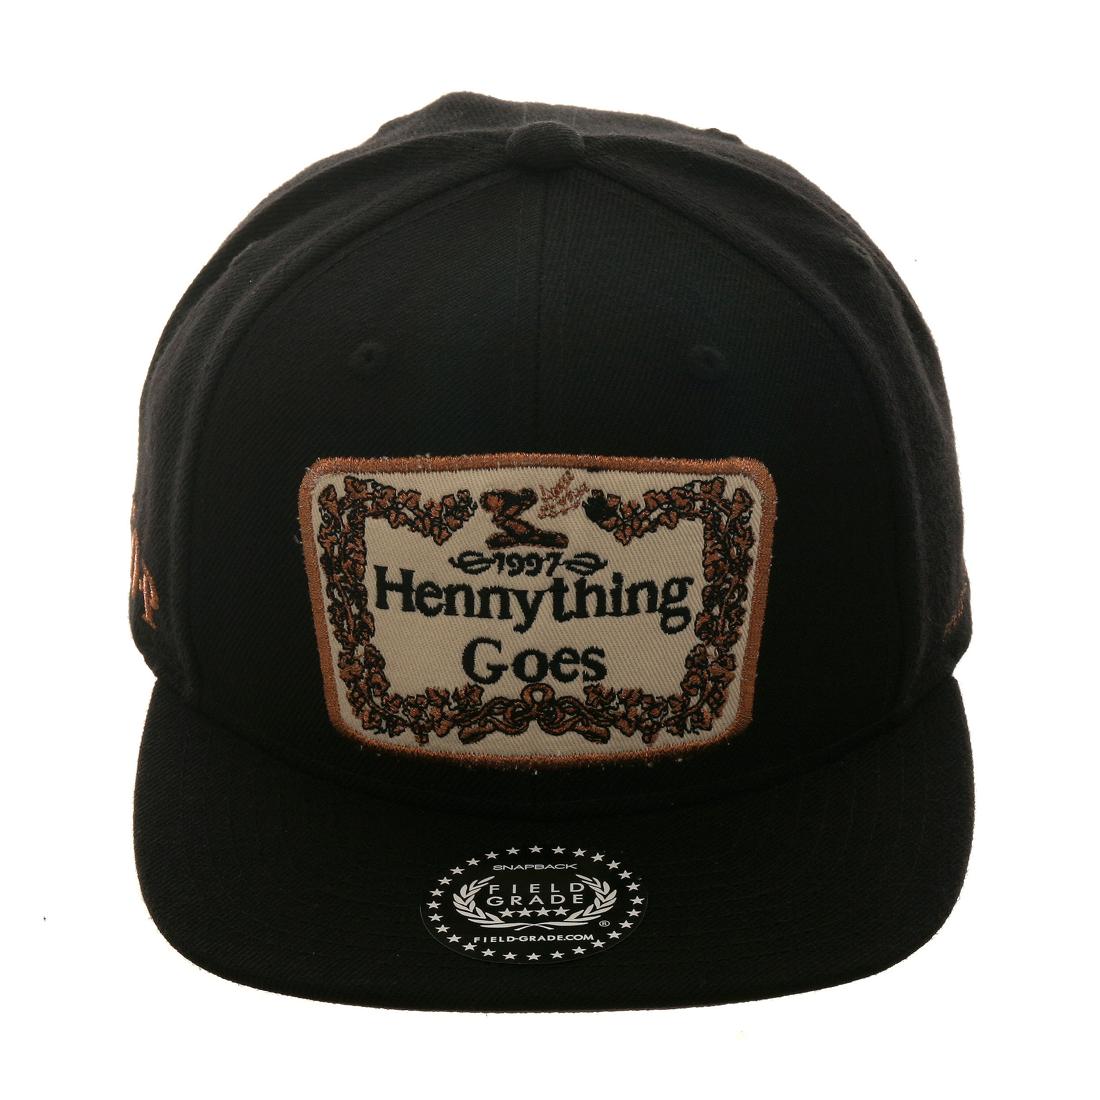 Hat Club The Phoenix Giants 😮 Milled